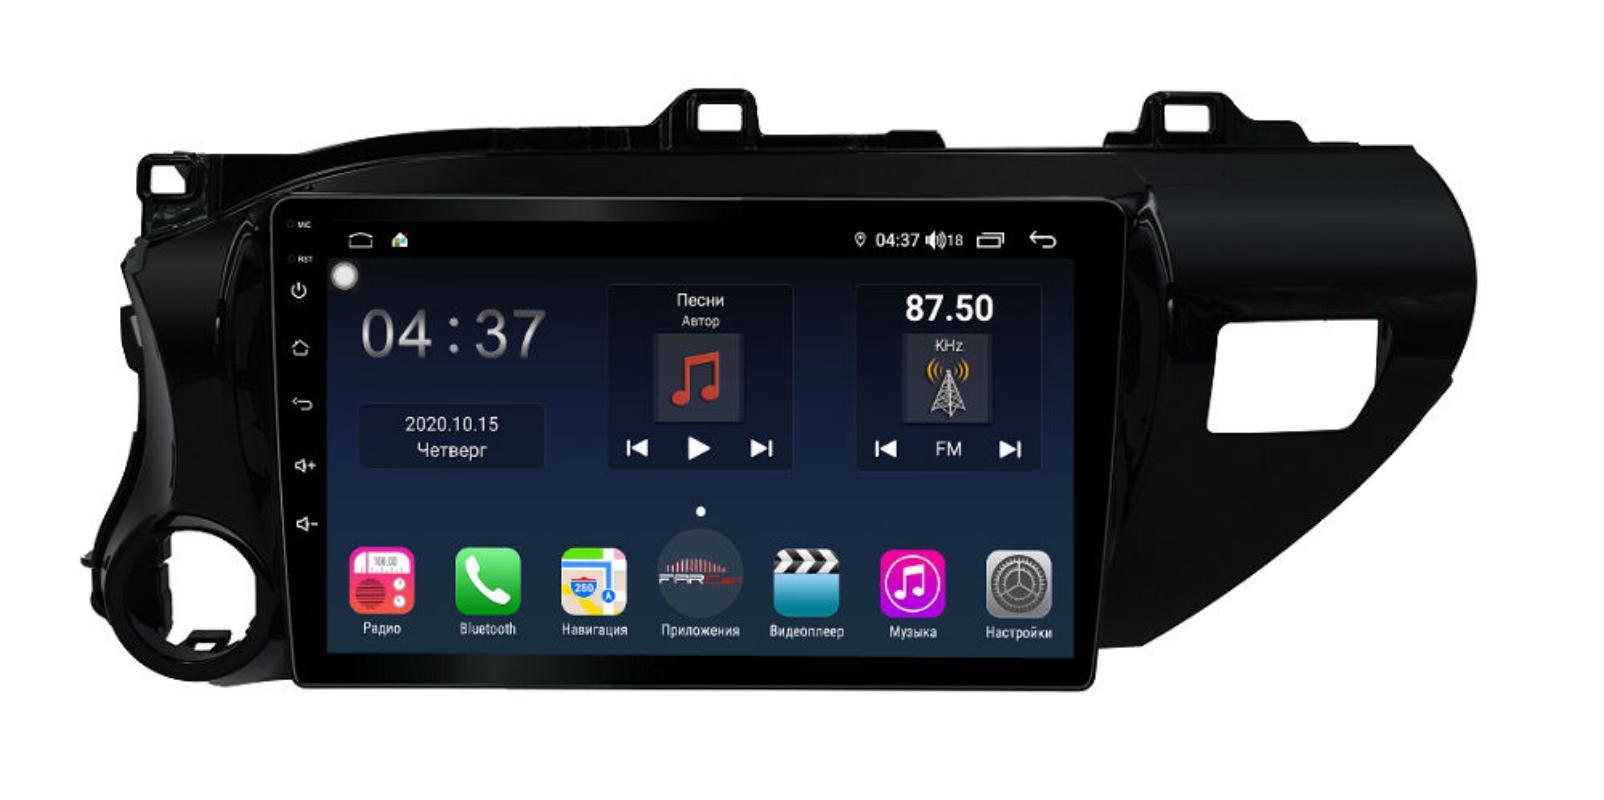 Штатная магнитола FarCar s400 Toyota Hilux на Android (TG1077R) (+ Камера заднего вида в подарок!)